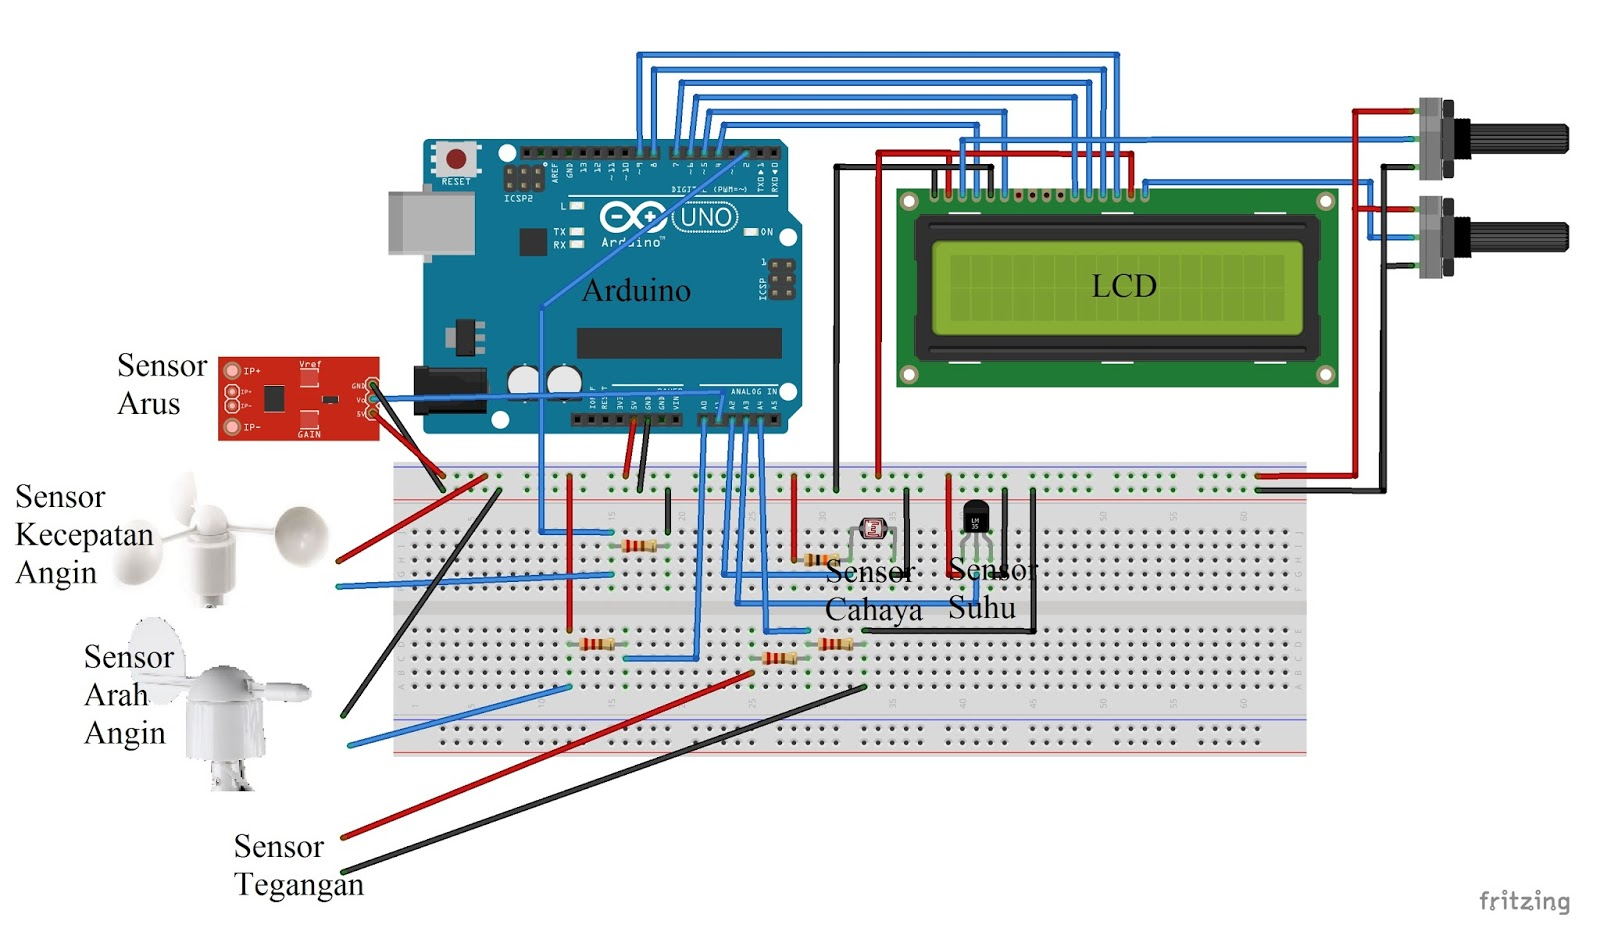 Pengertian kegunaan dan fungsi arduino electricity of dream